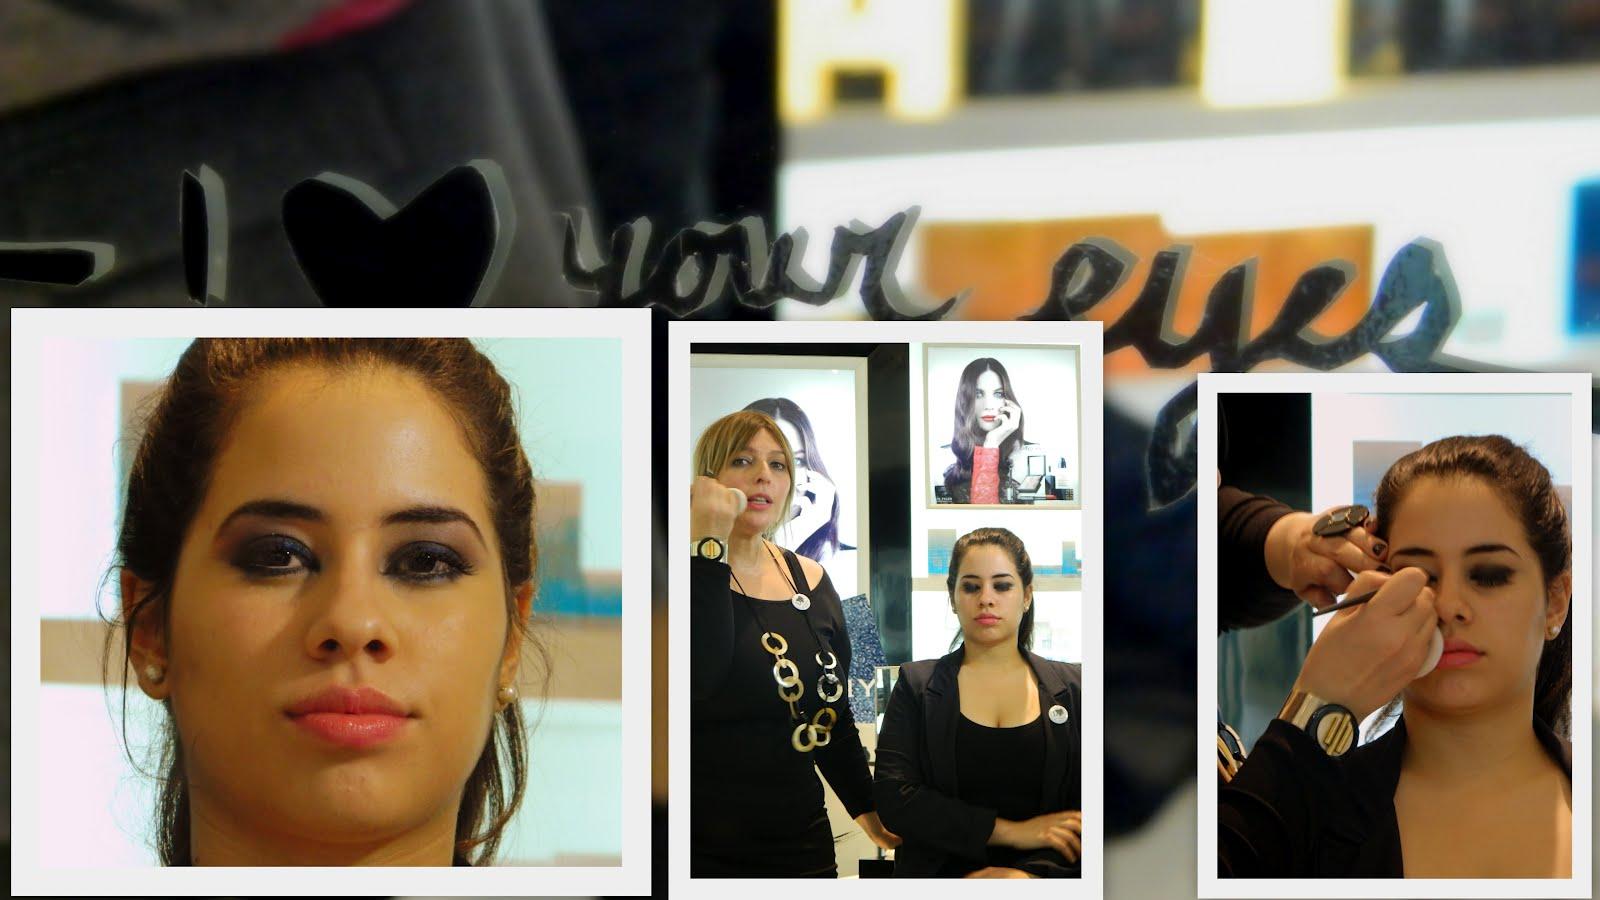 http://1.bp.blogspot.com/-Y7jnSyzTd00/T6c61NK_BkI/AAAAAAAAGag/perP5j5eDeY/s1600/Givenchy.jpg